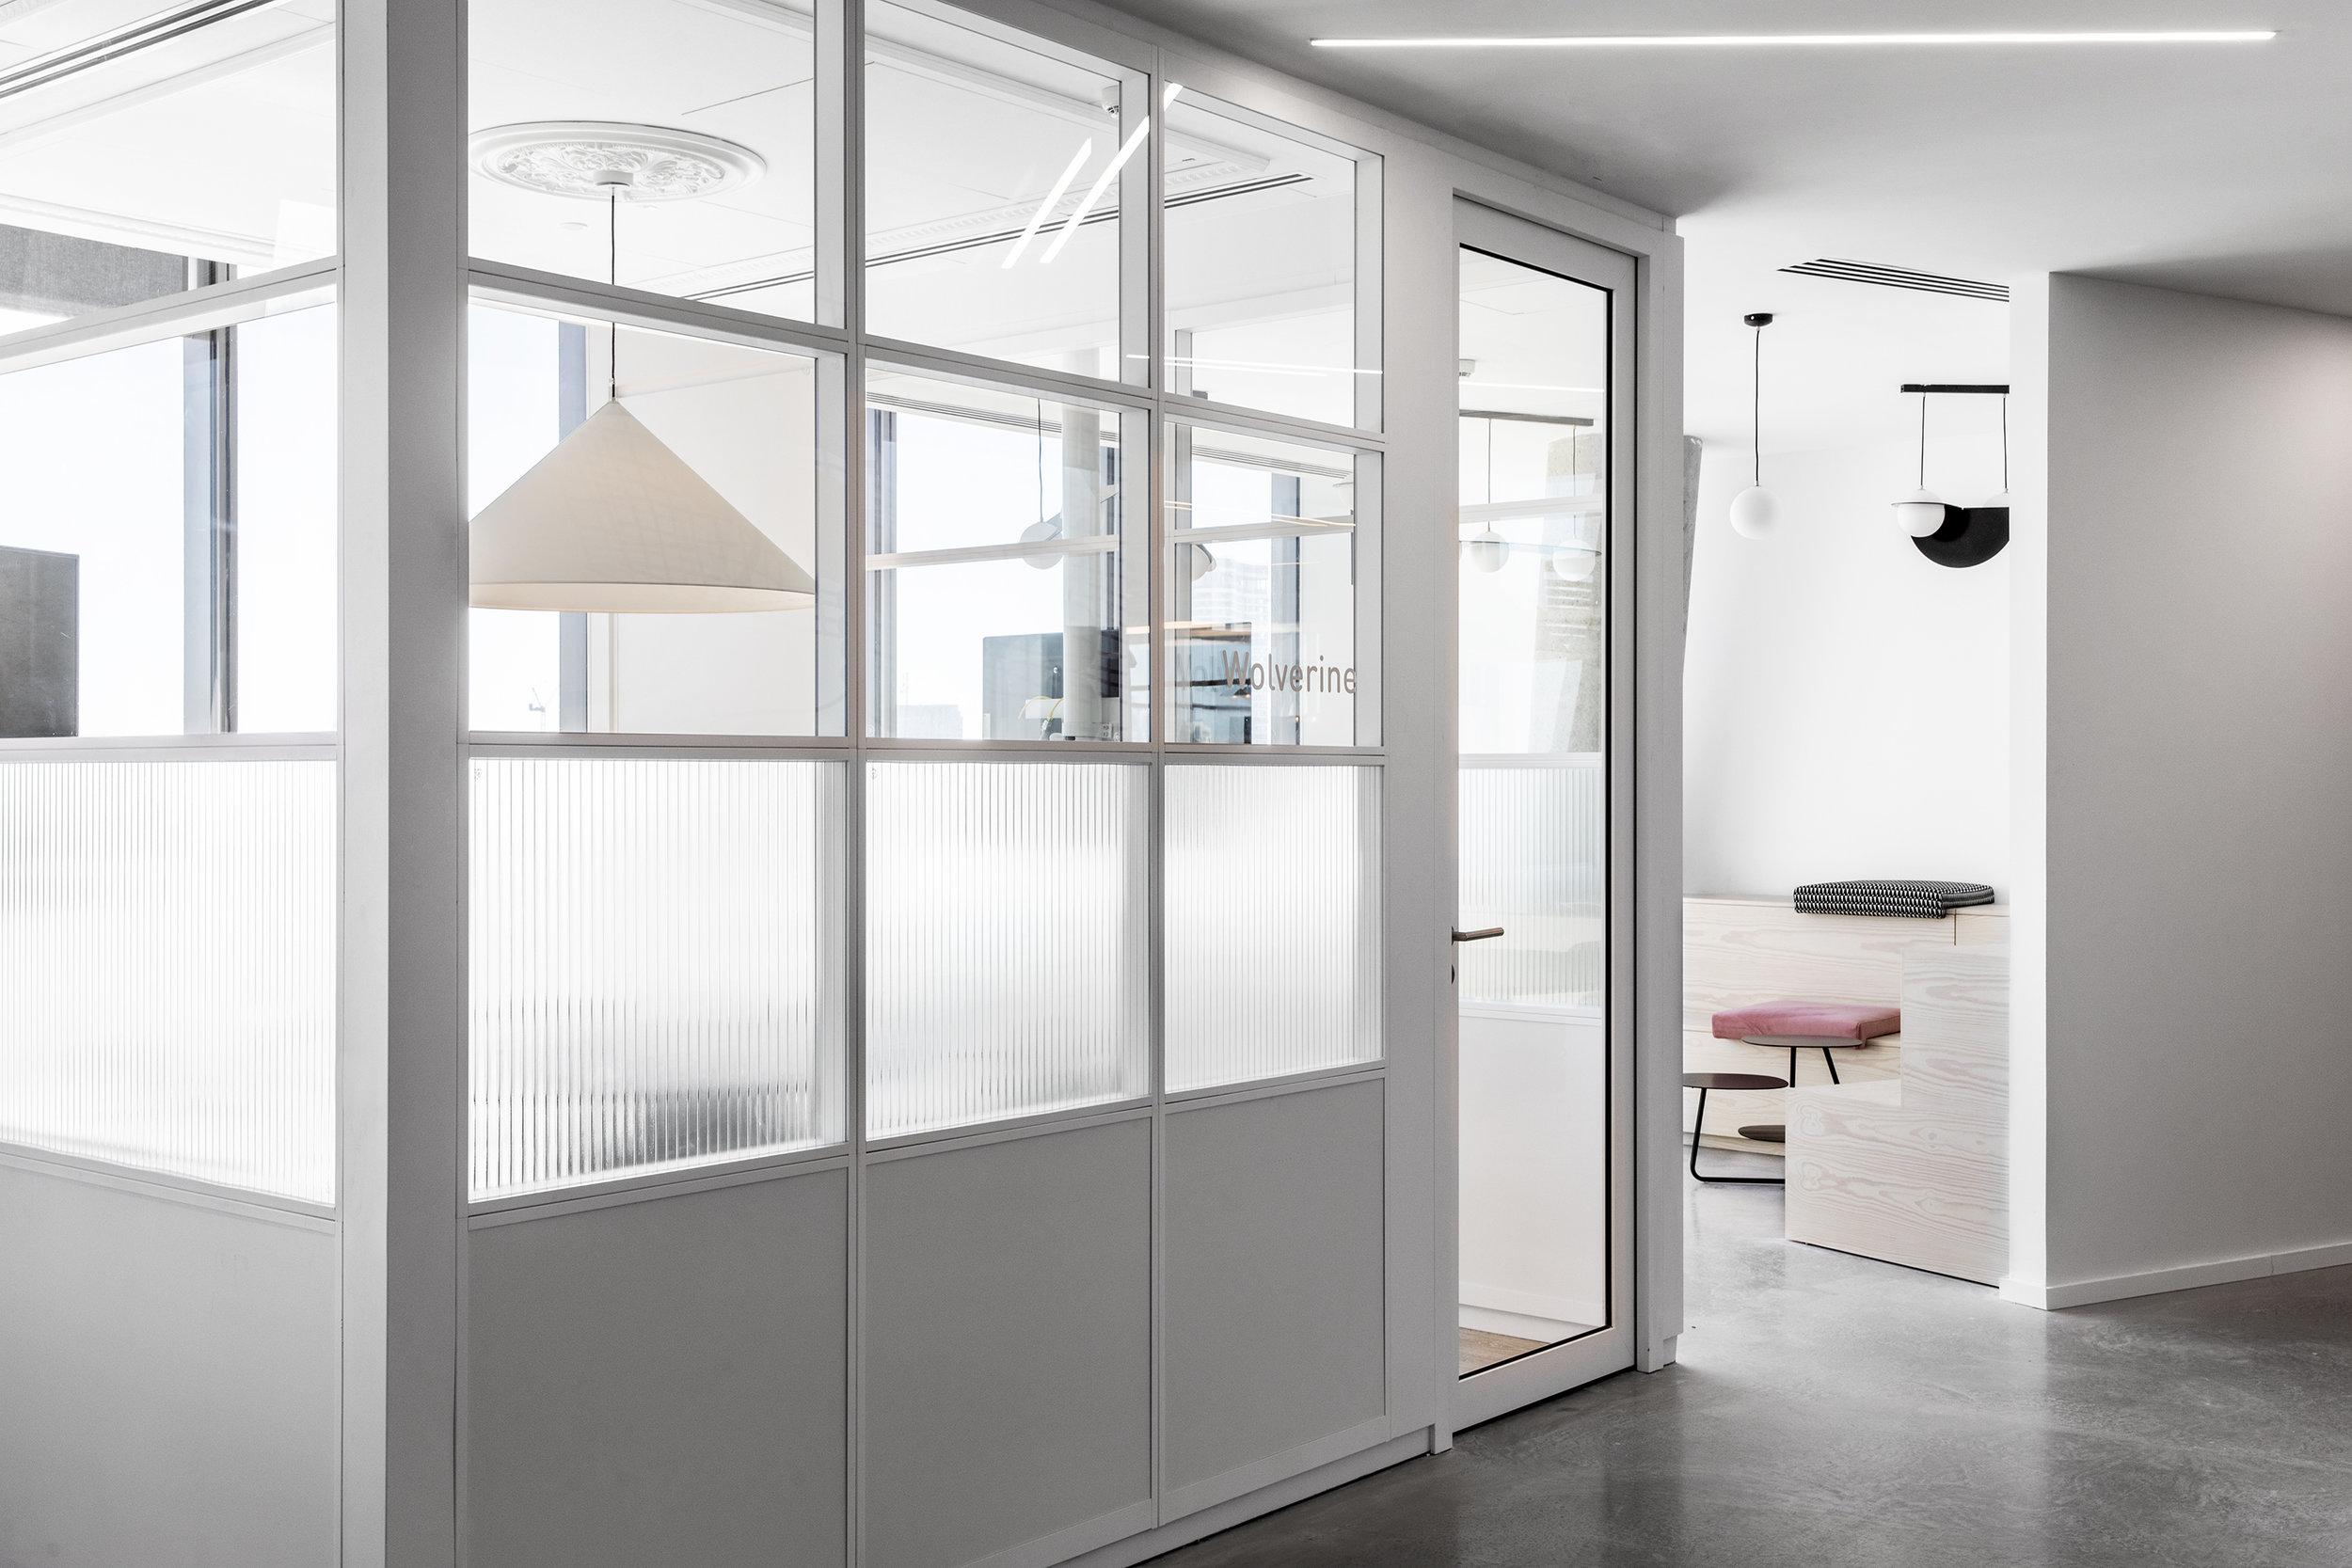 רואי דוד אדריכלות - אדריכל - נטורל אינטליג'נס - ROY DAVID - ARCHITECTURE - ARCHITECT - NI (85).jpg